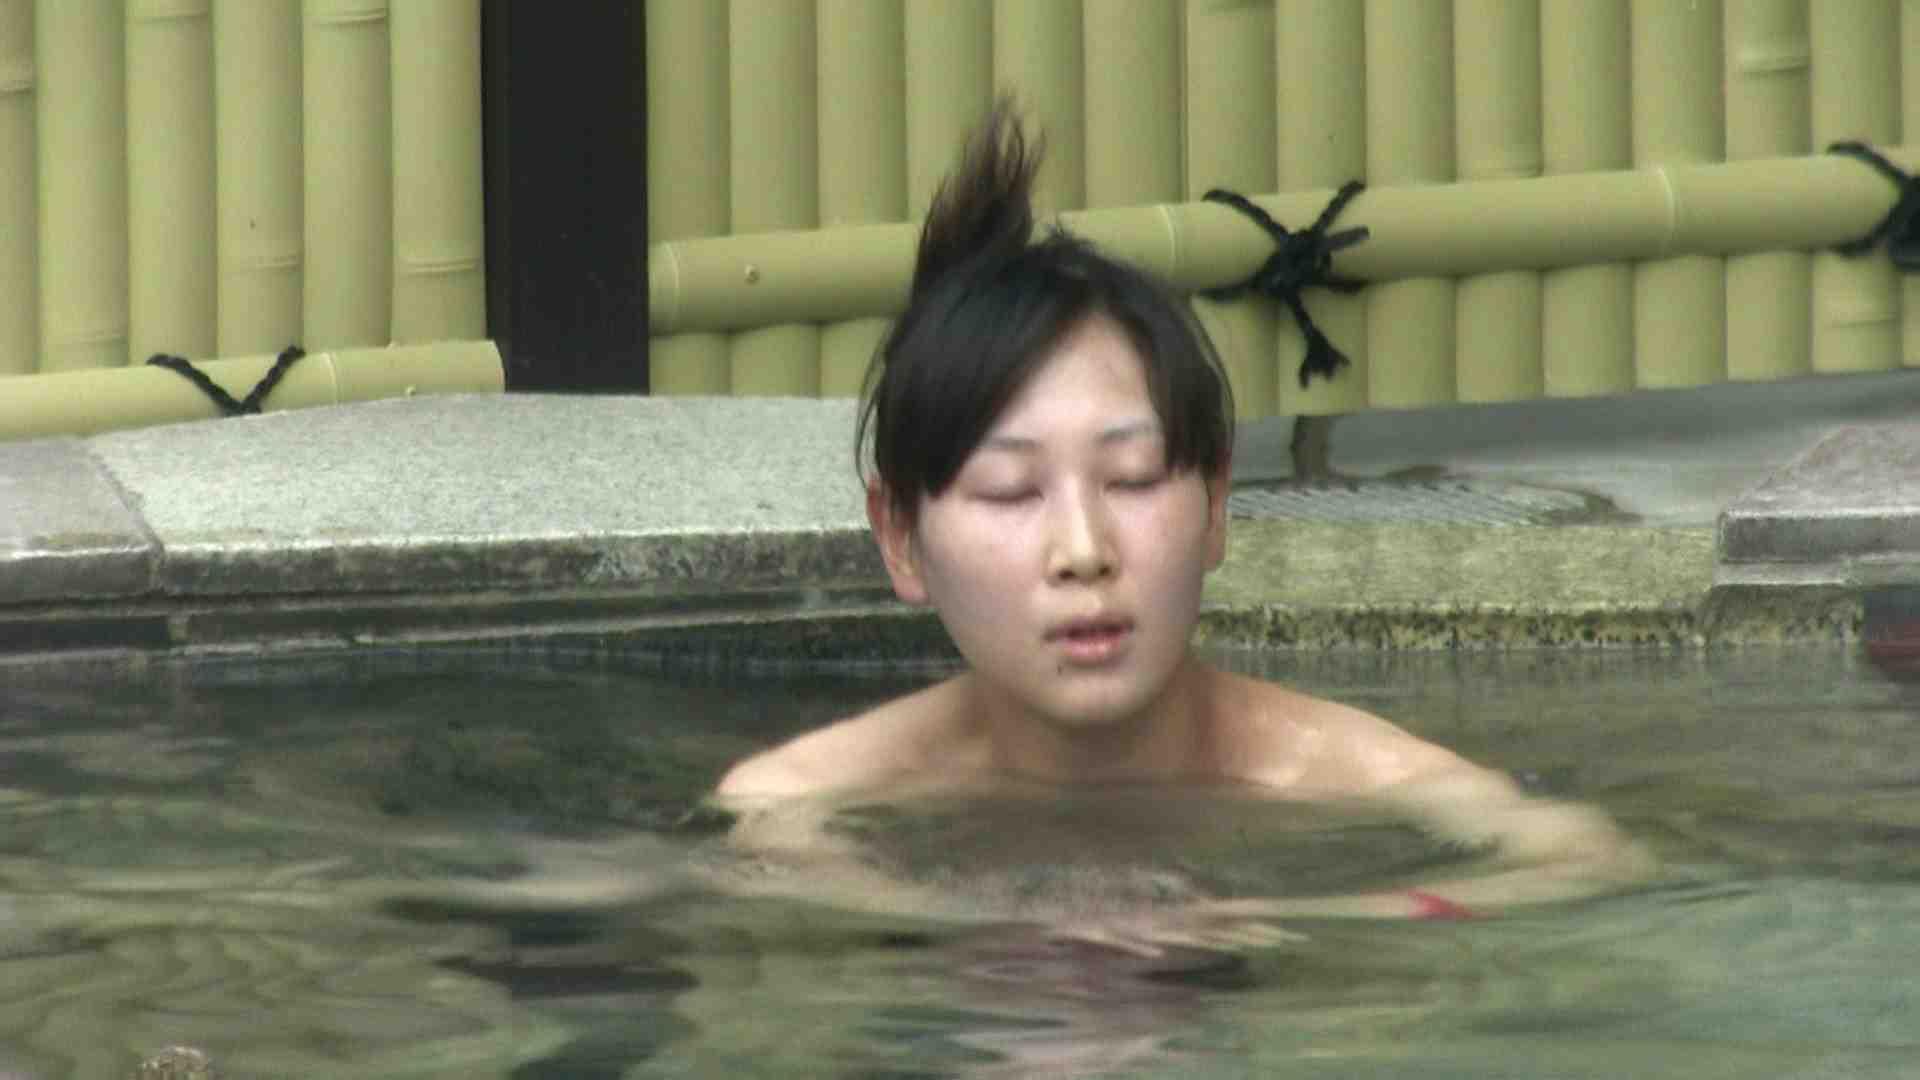 Aquaな露天風呂Vol.665 HなOL   盗撮  104pic 71